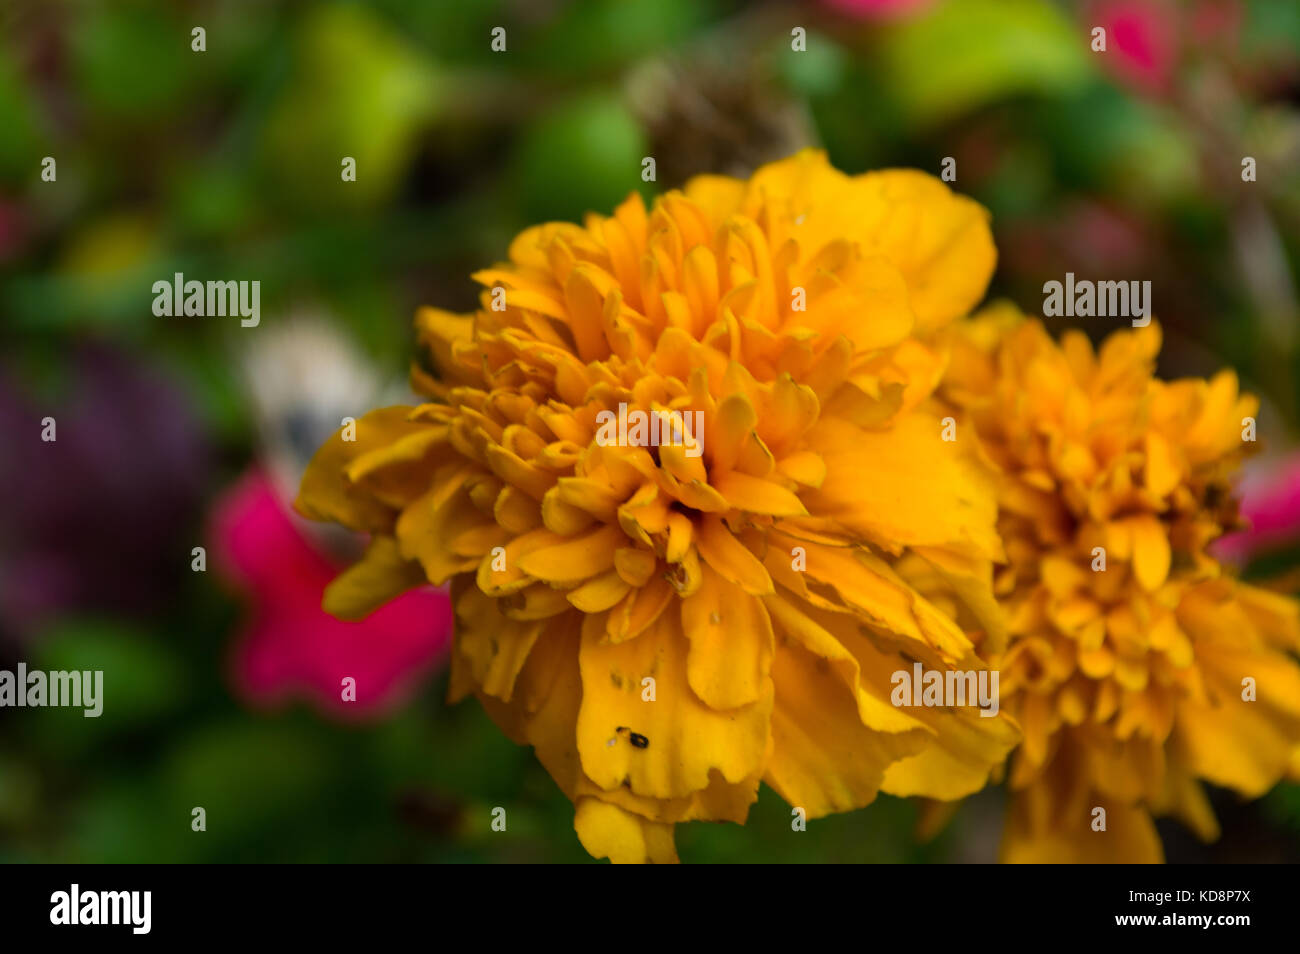 October Birthday Flower Imgenes De Stock October Birthday Flower